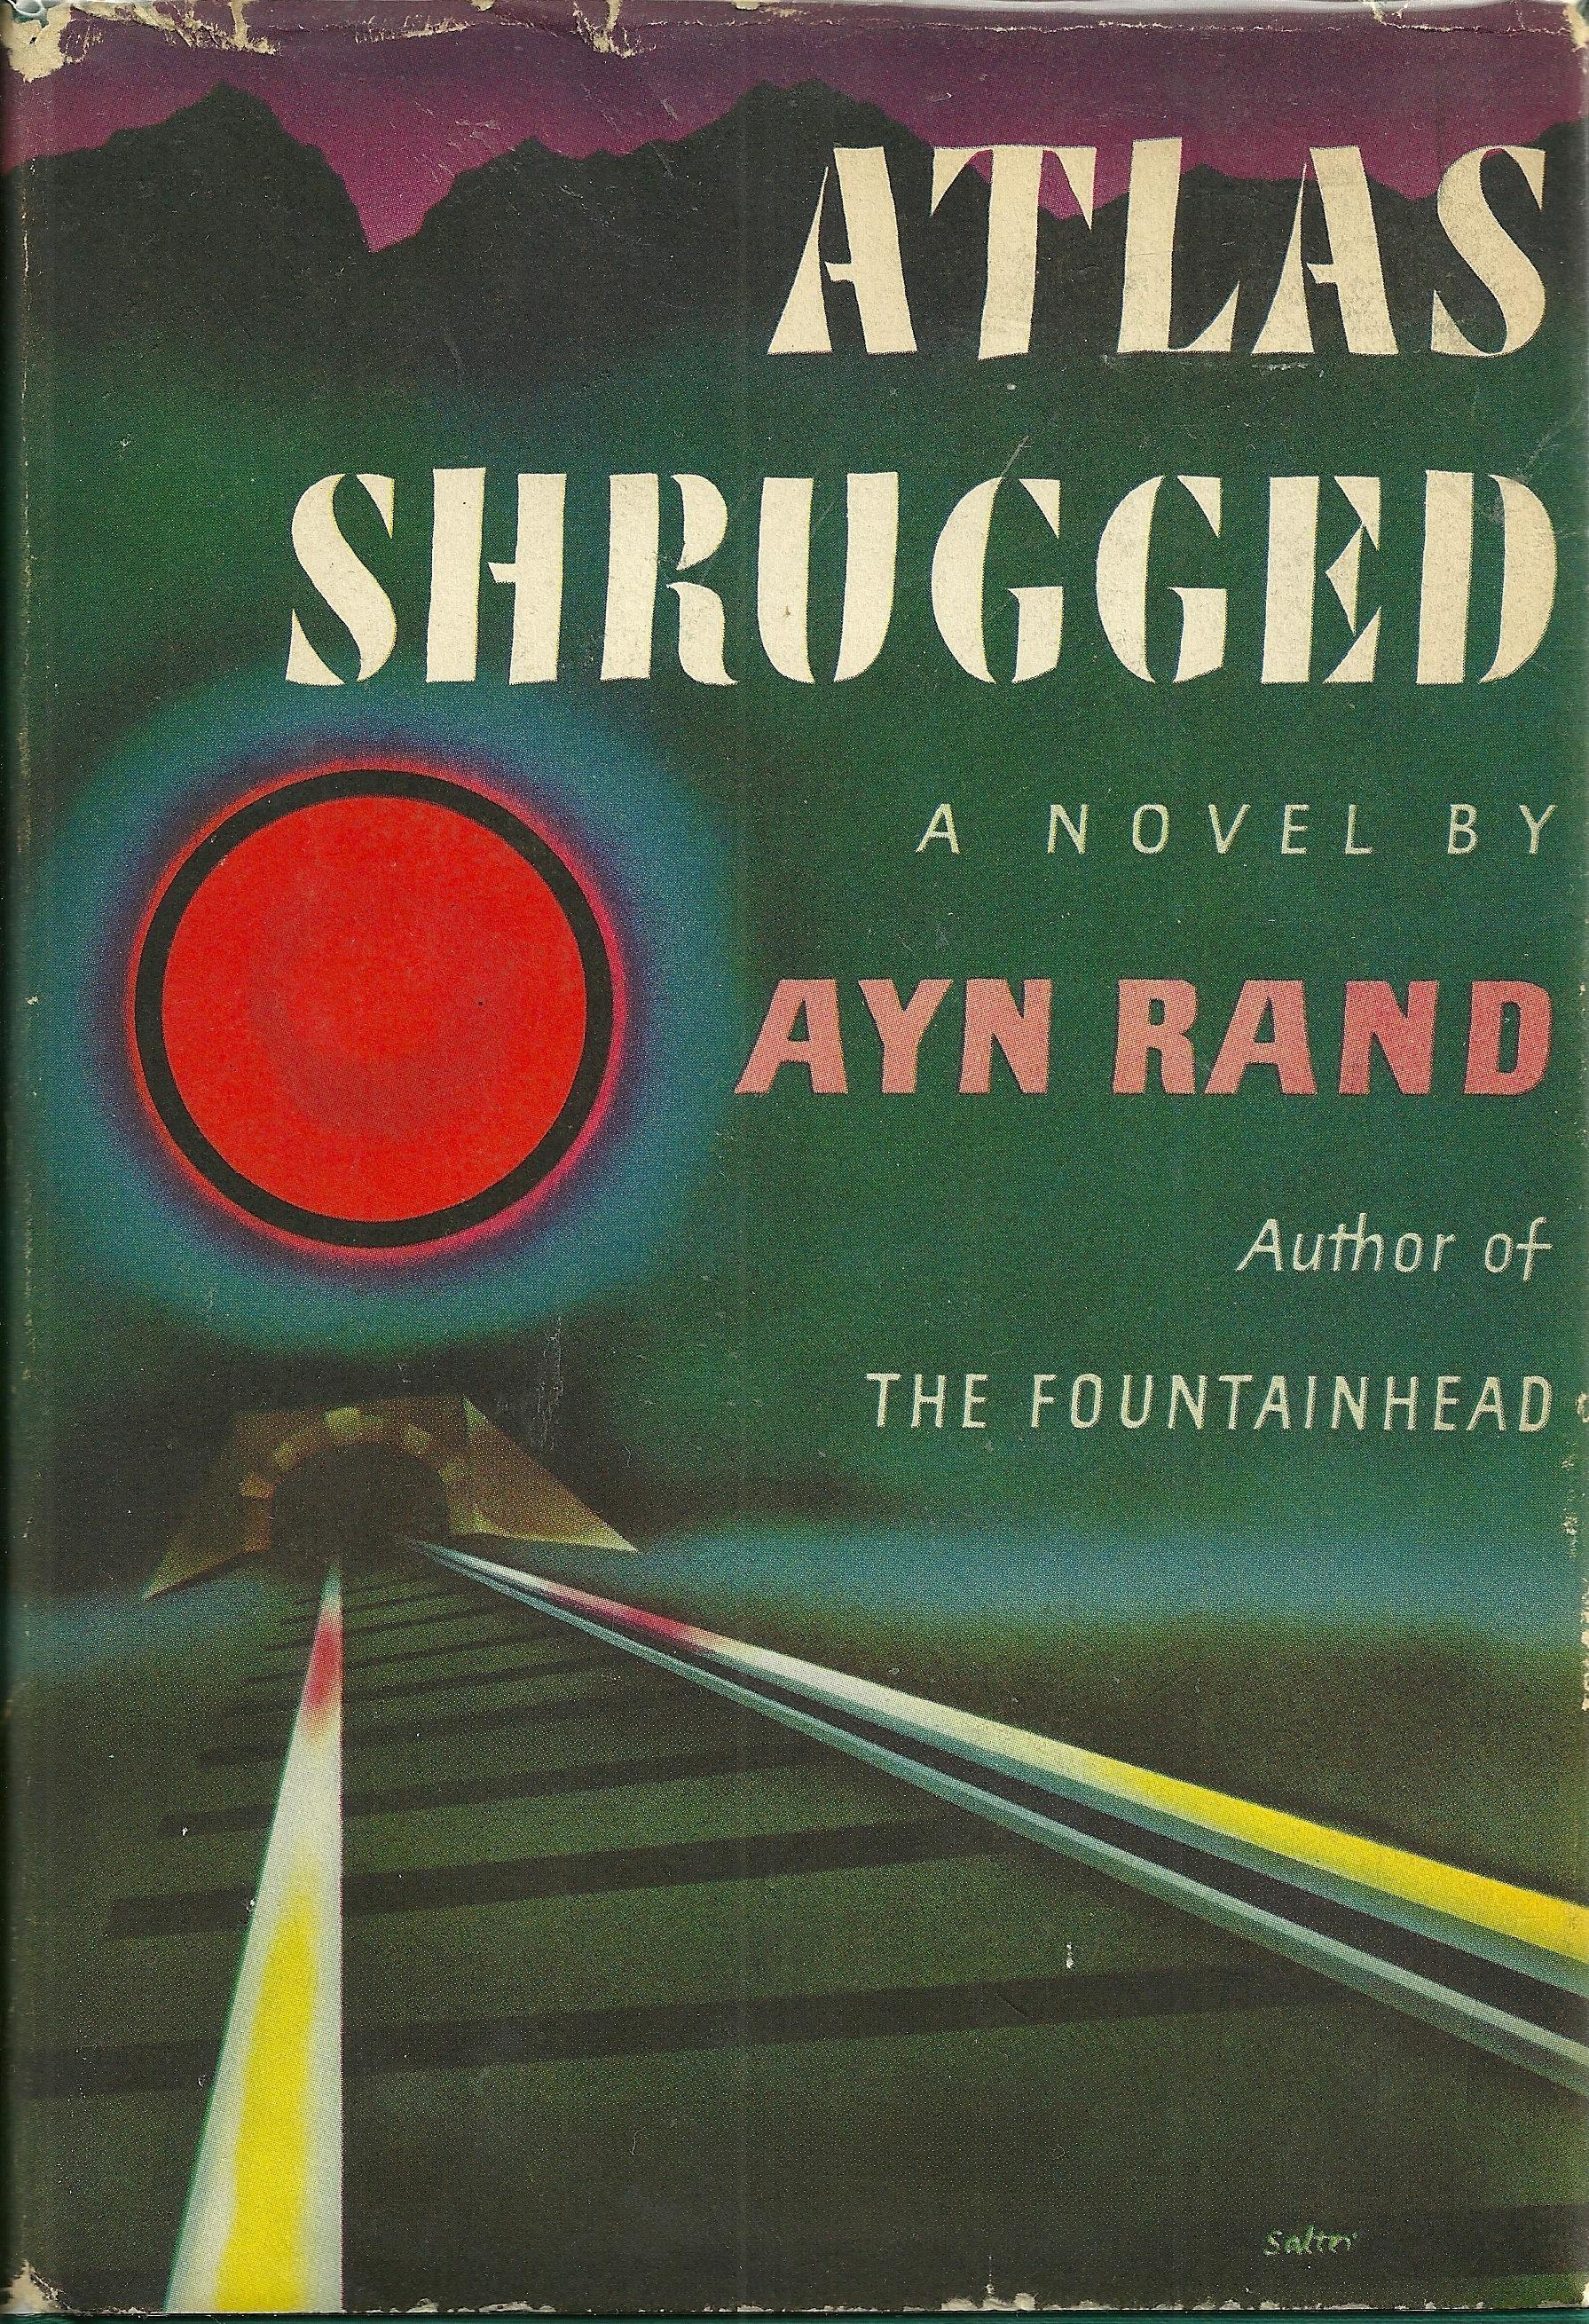 Book Design With Regard To Atlas Shrugged Cover Art (Image 11 of 20)